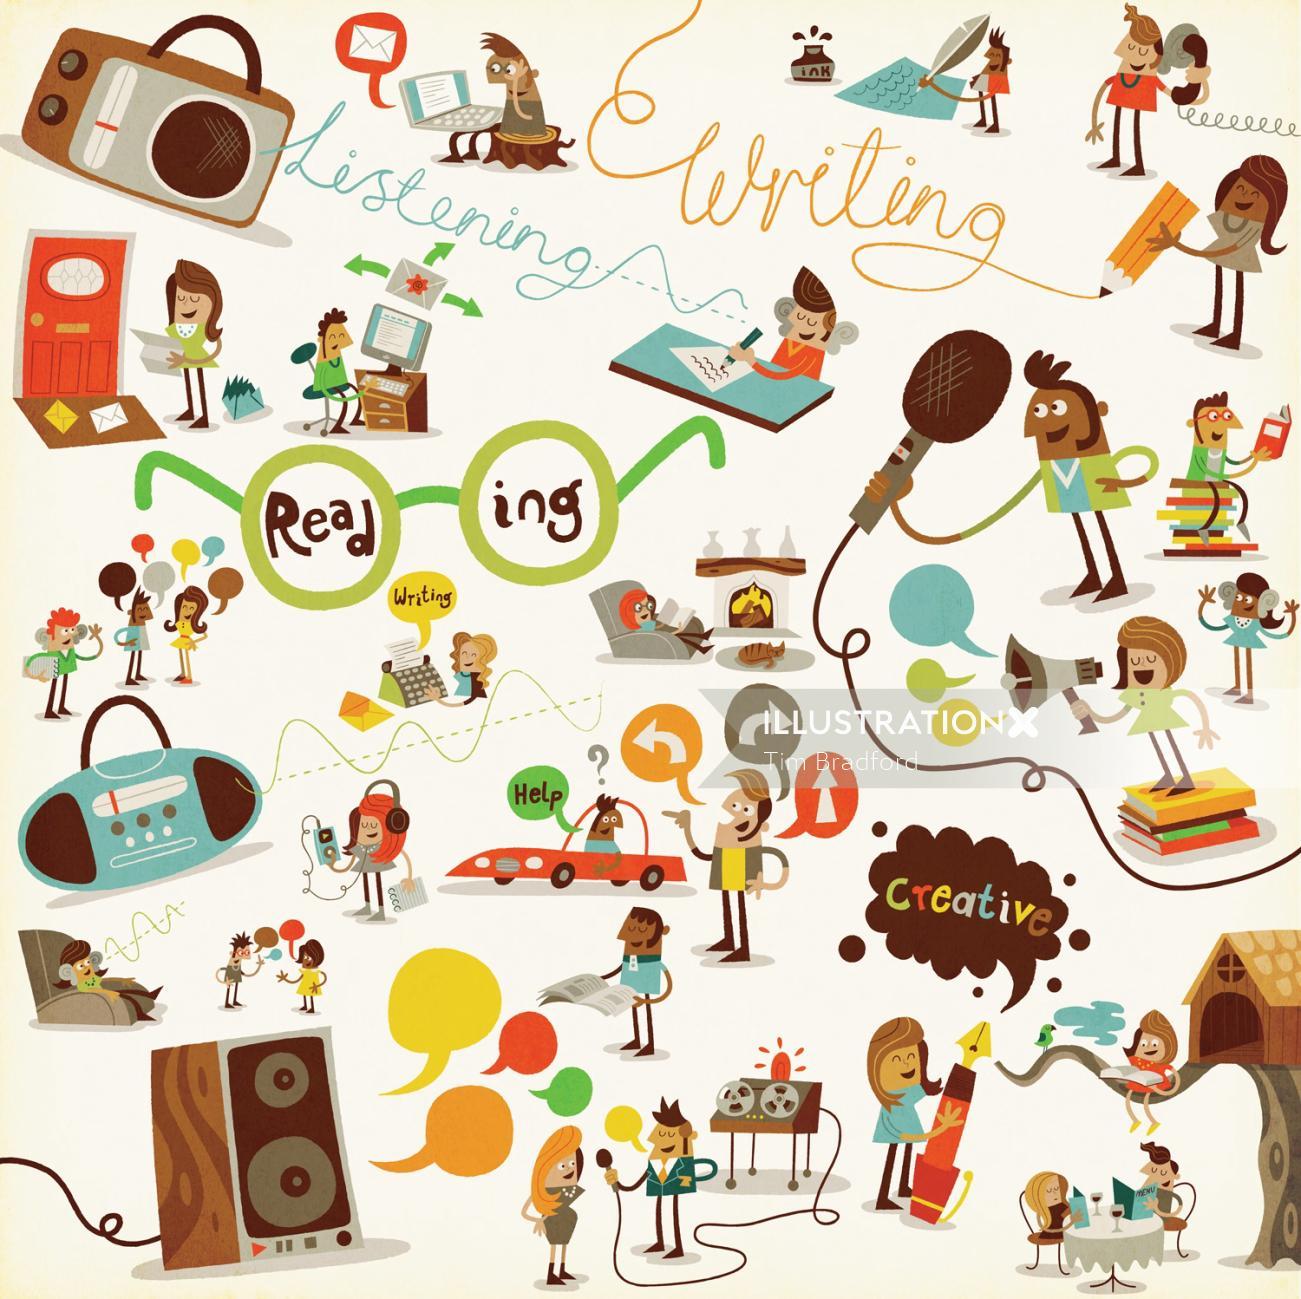 People different activities